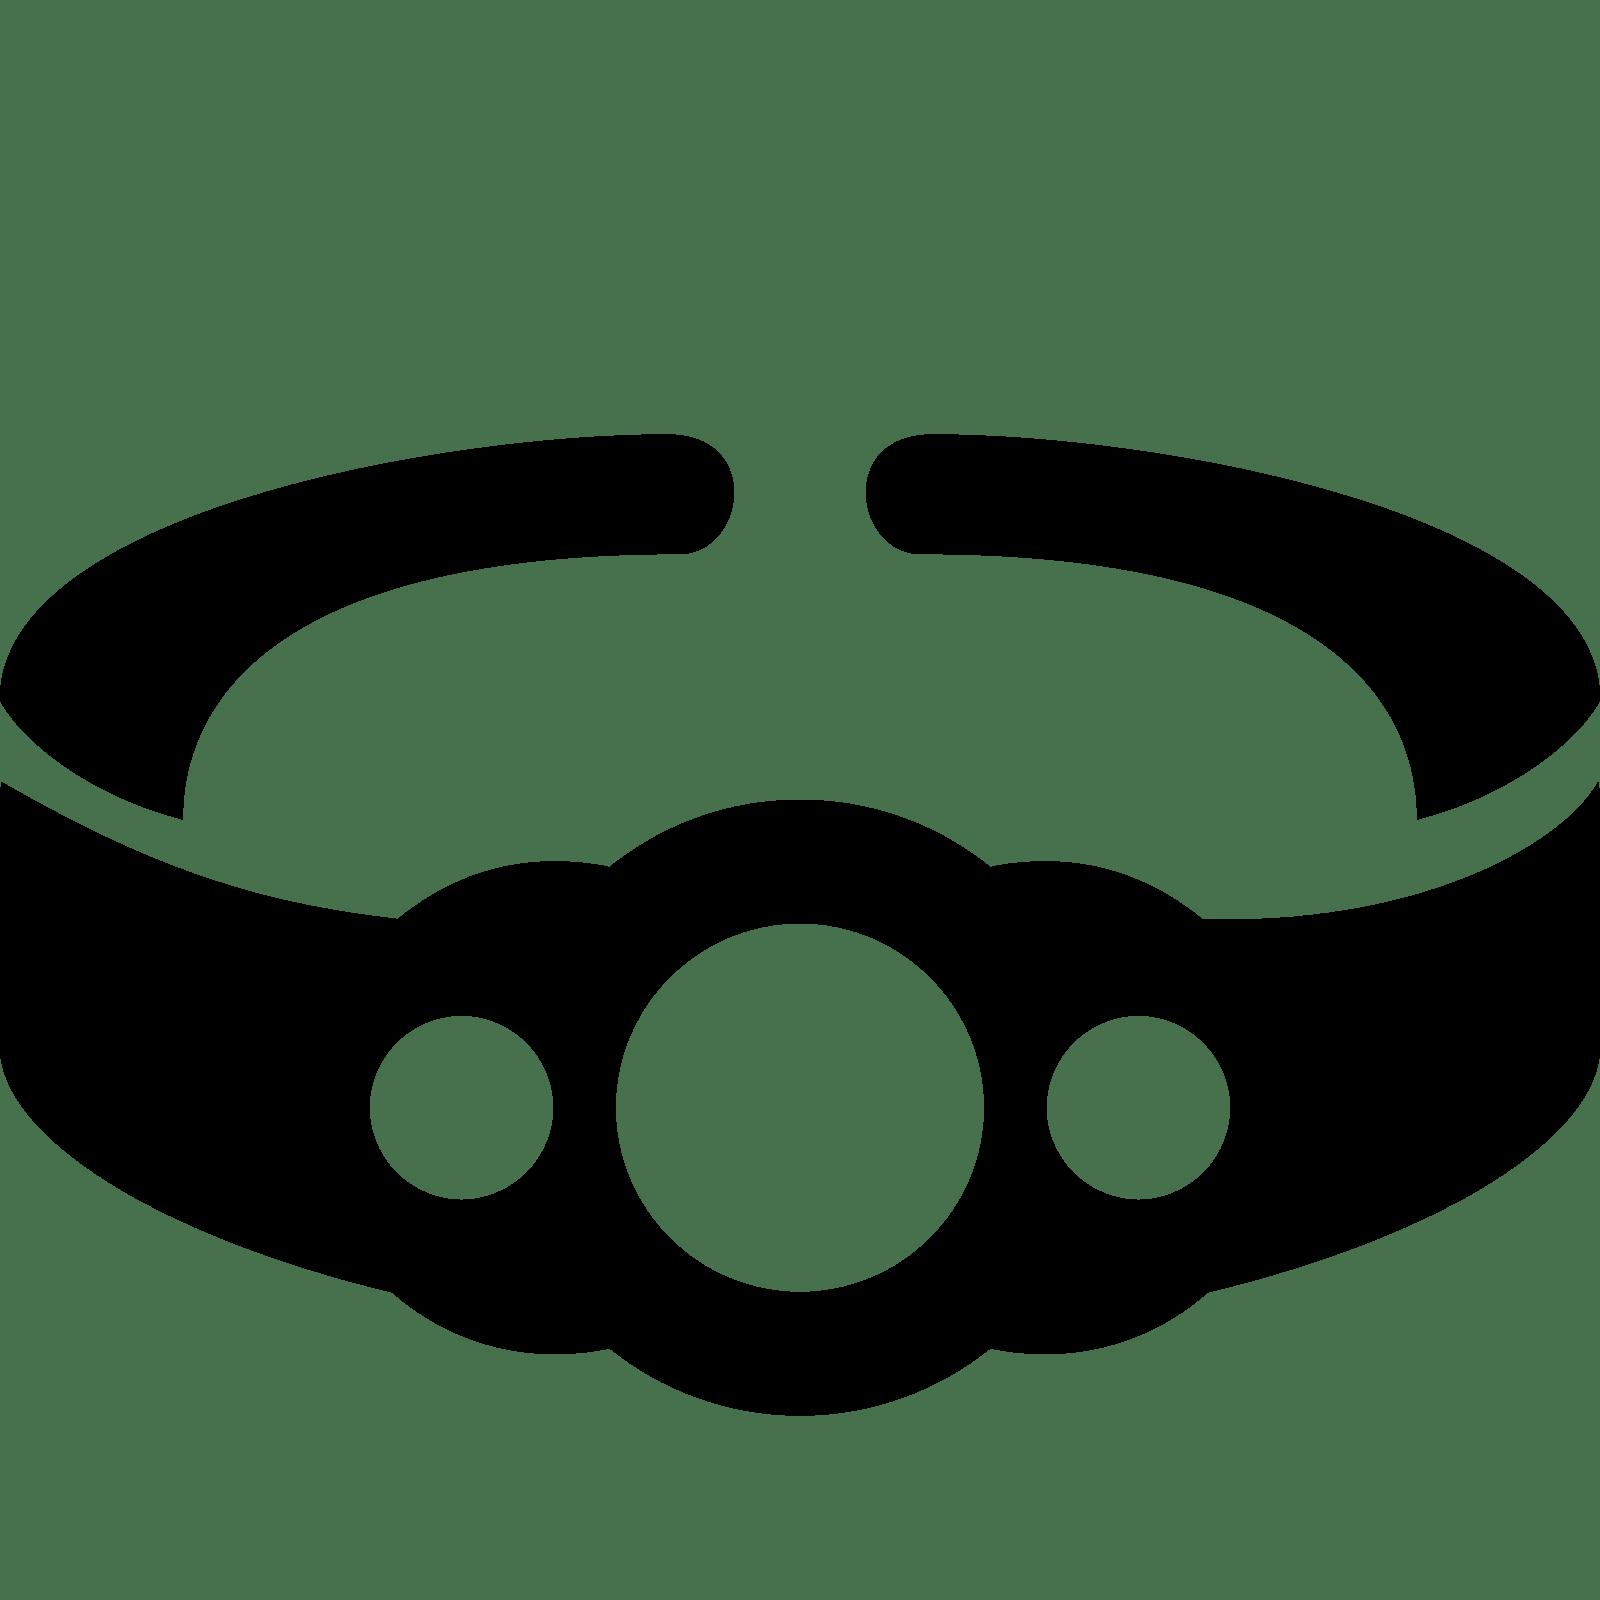 WWE clipart champion belt Free Wwe Belt Icons